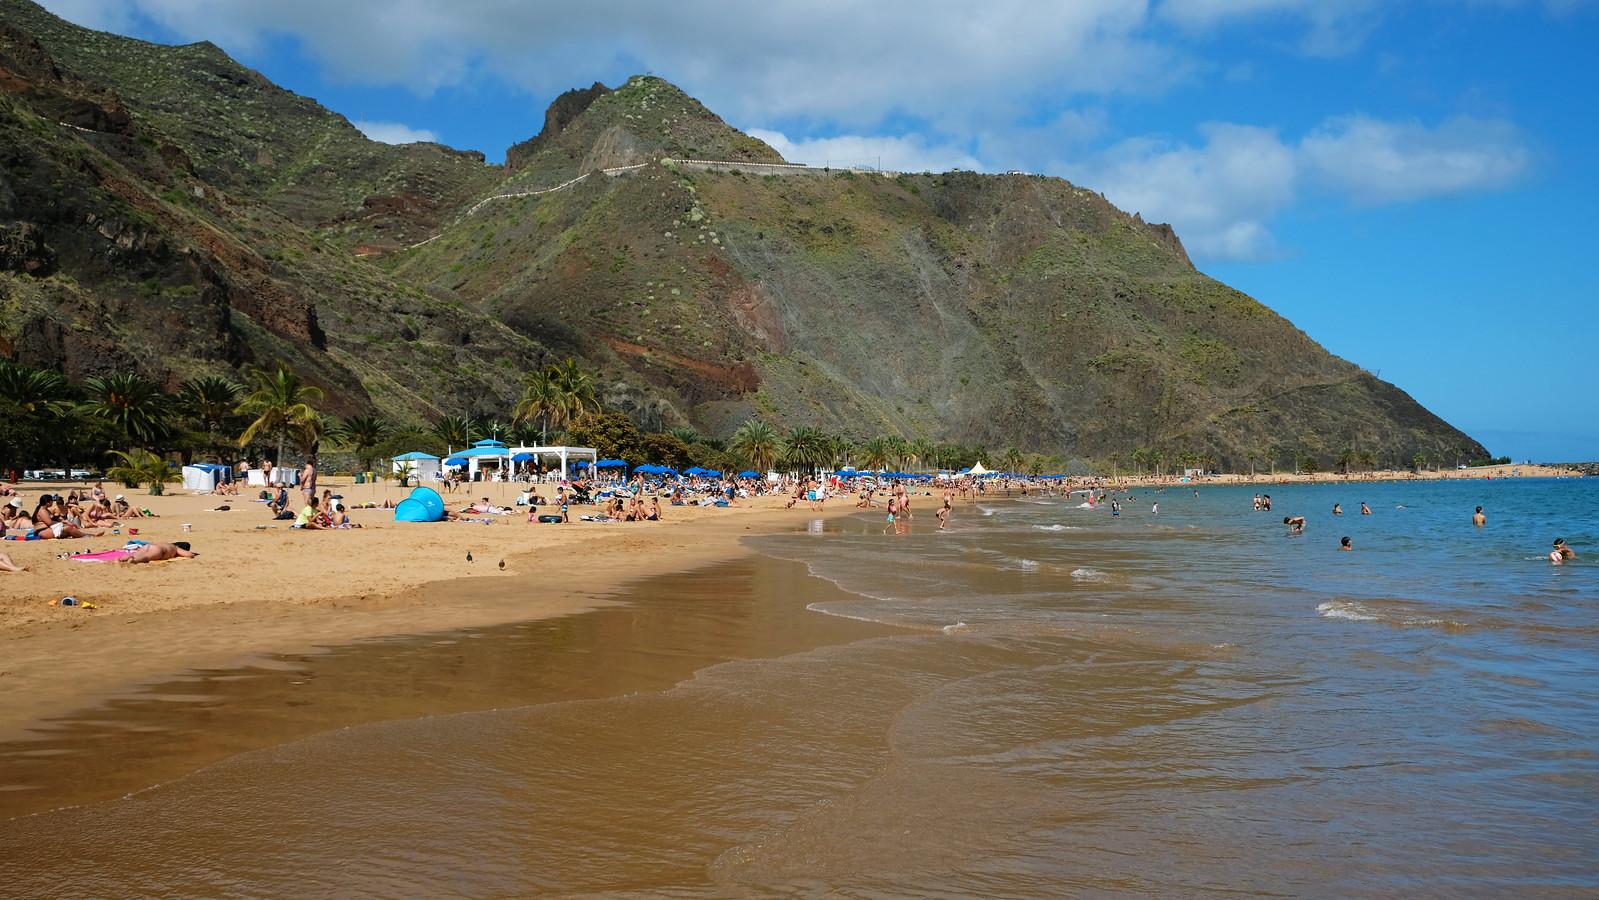 Playa de las Teresitas, Tenerife, Canary Islands, Spain